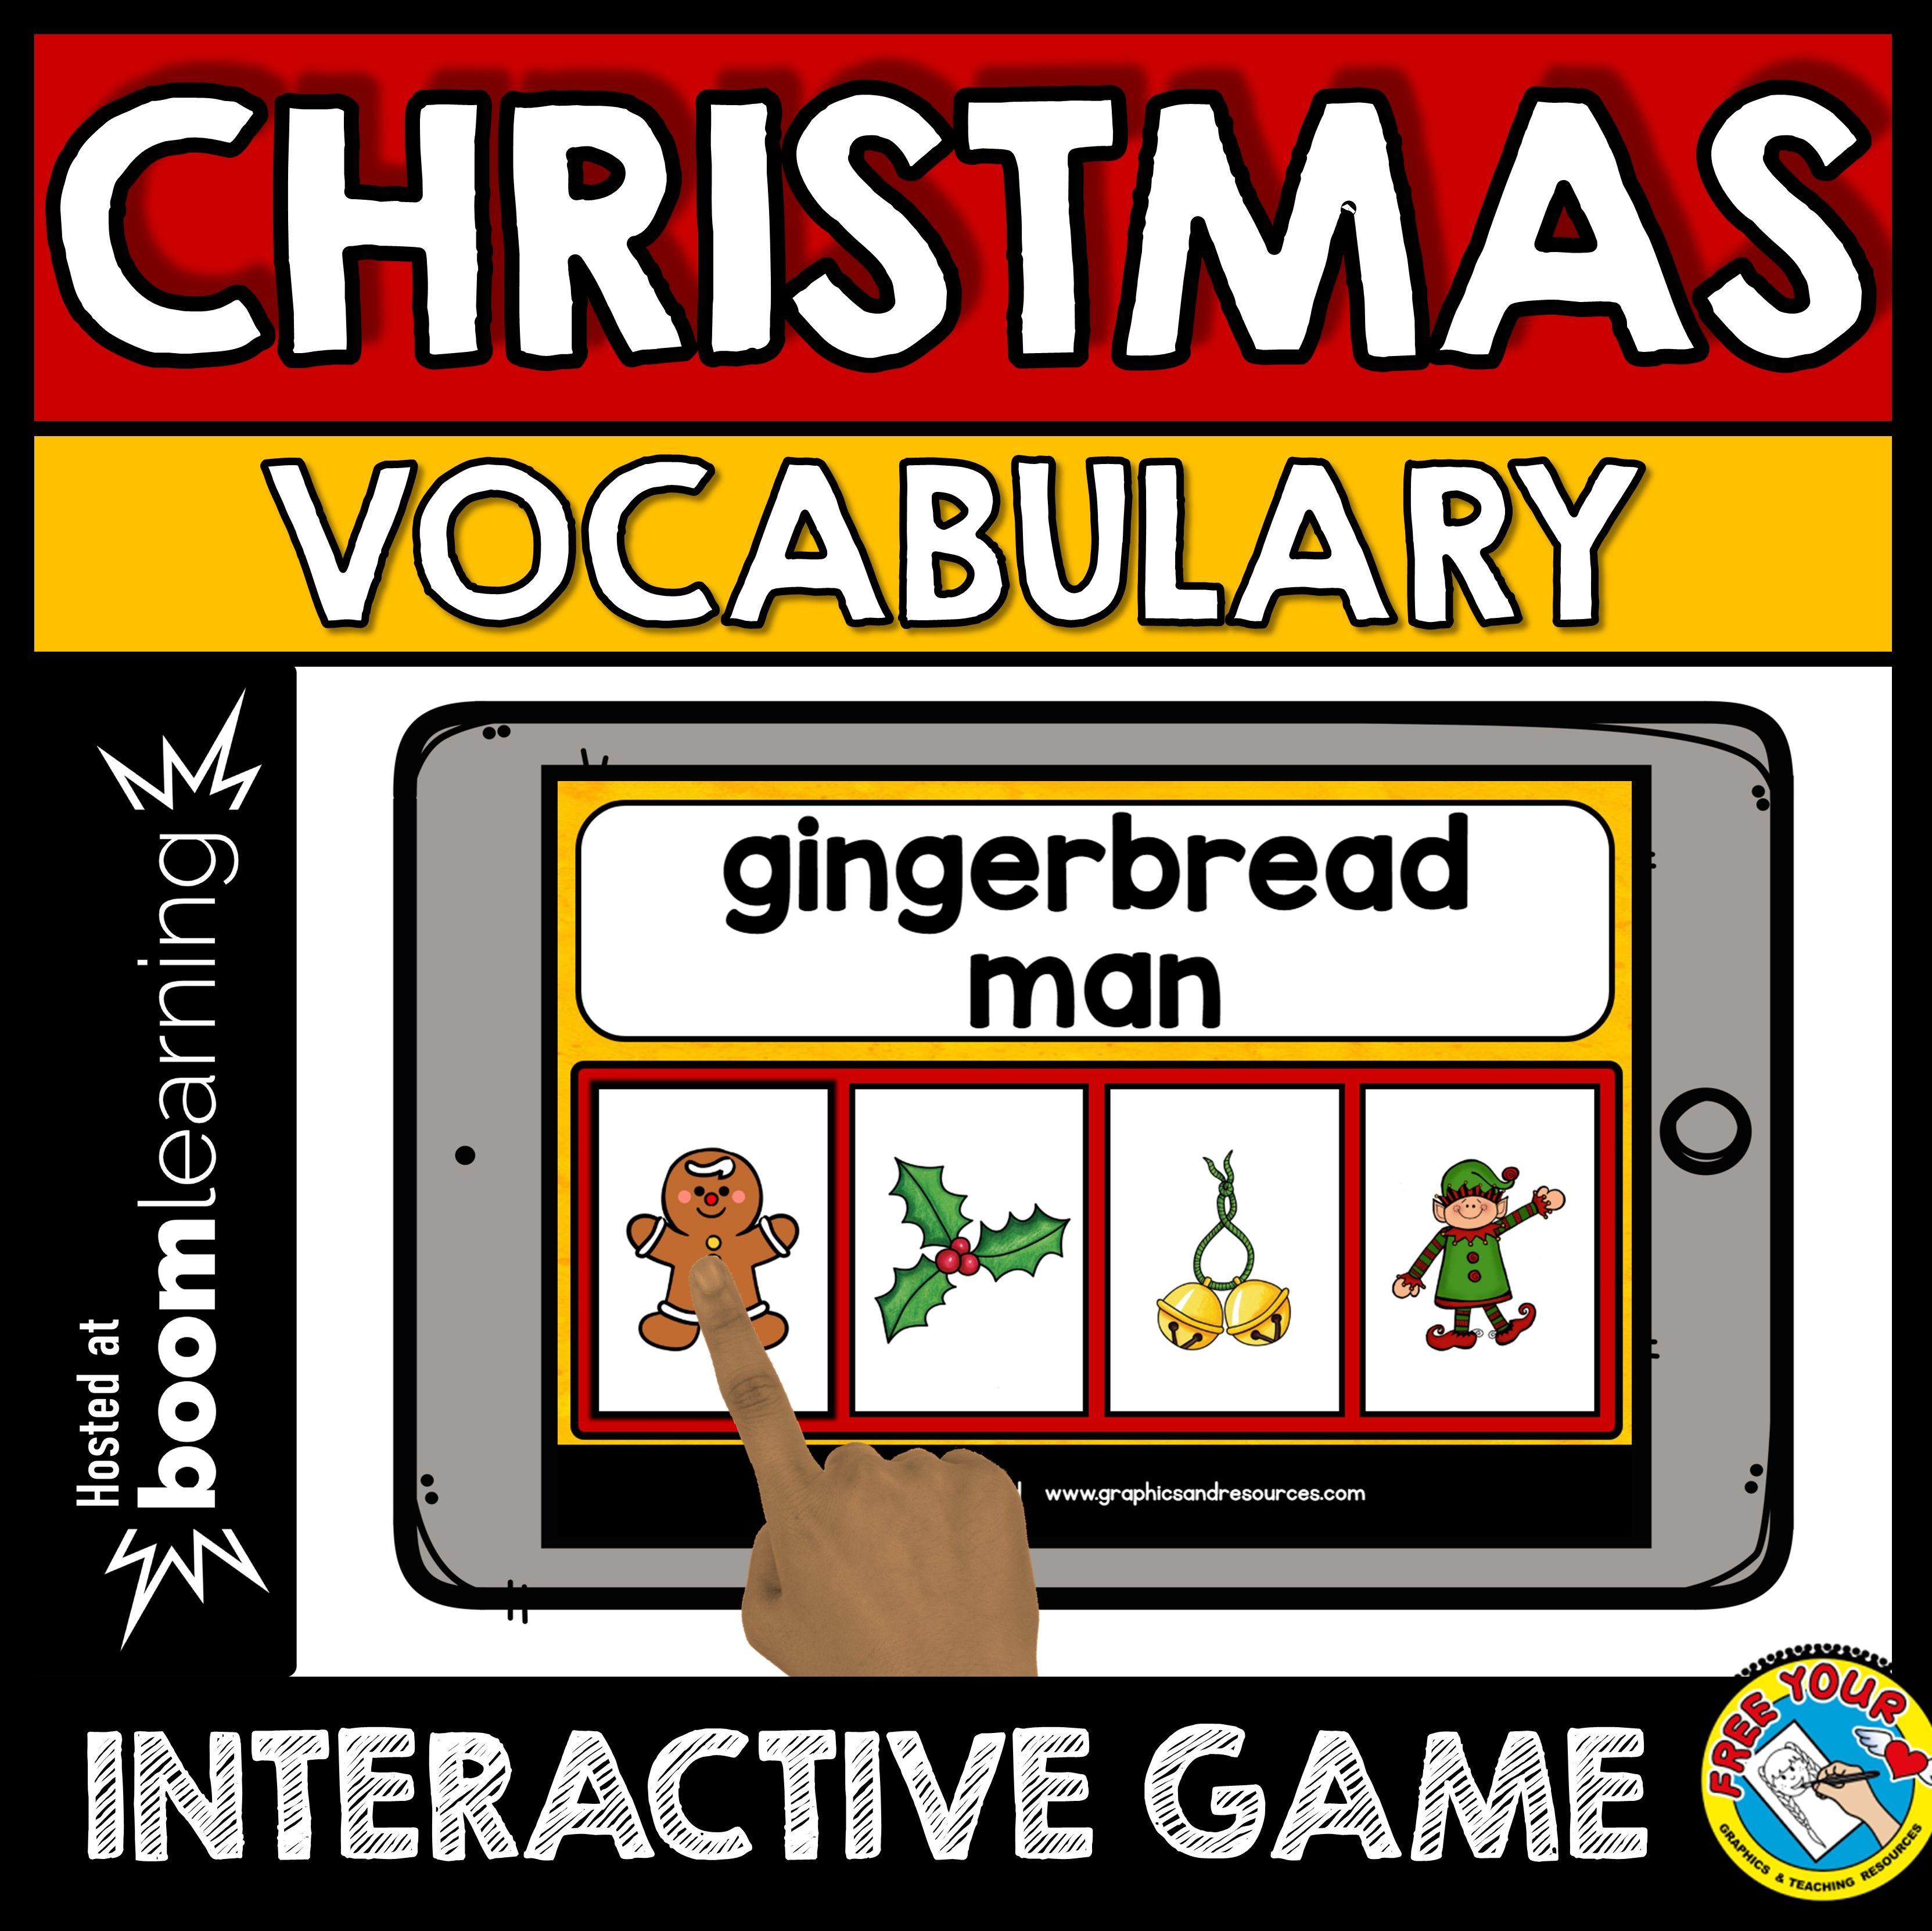 A fun Christmas vocabulary game where children read each